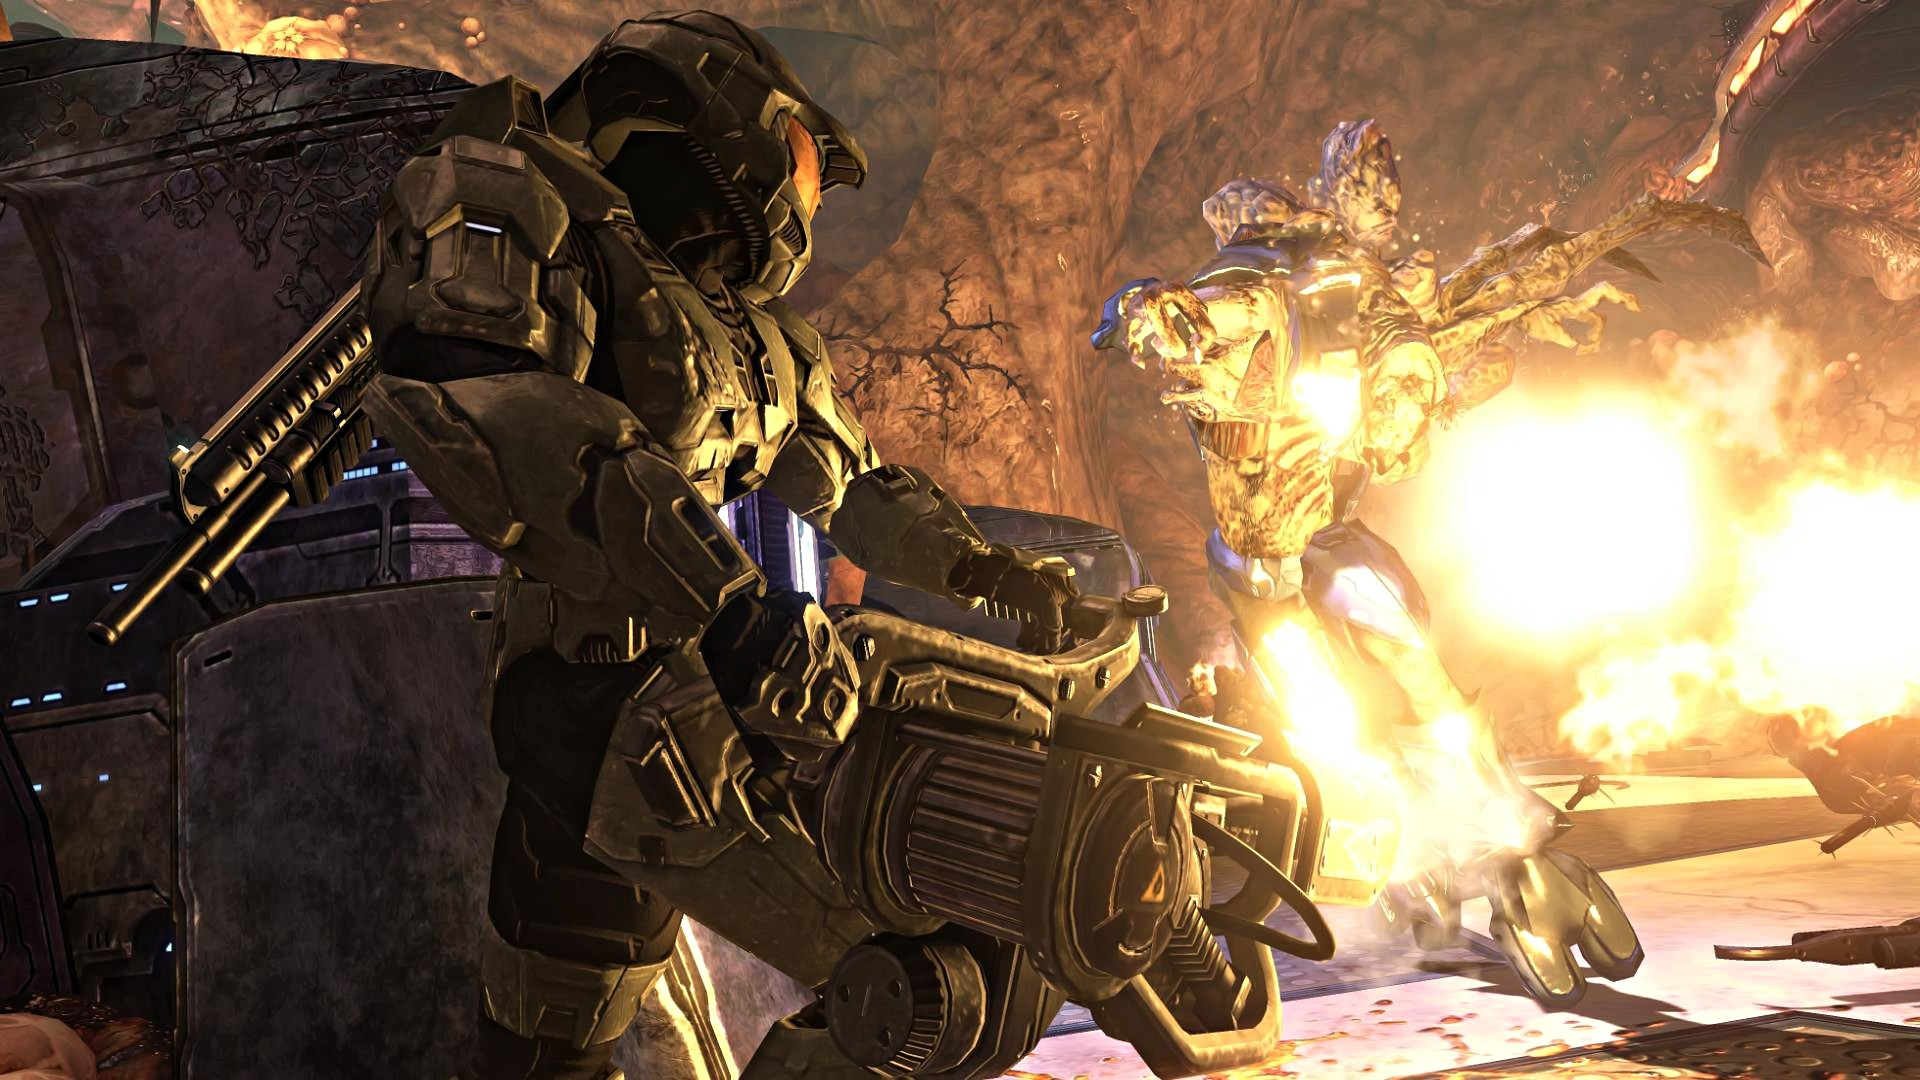 Image – Halo-3-Wallpaper-CORTANA-chapter-1080p-16-MASTER-CHIEF-FLAMETHROWER.jpg  | Deadliest Fiction Wiki | FANDOM powered by Wikia